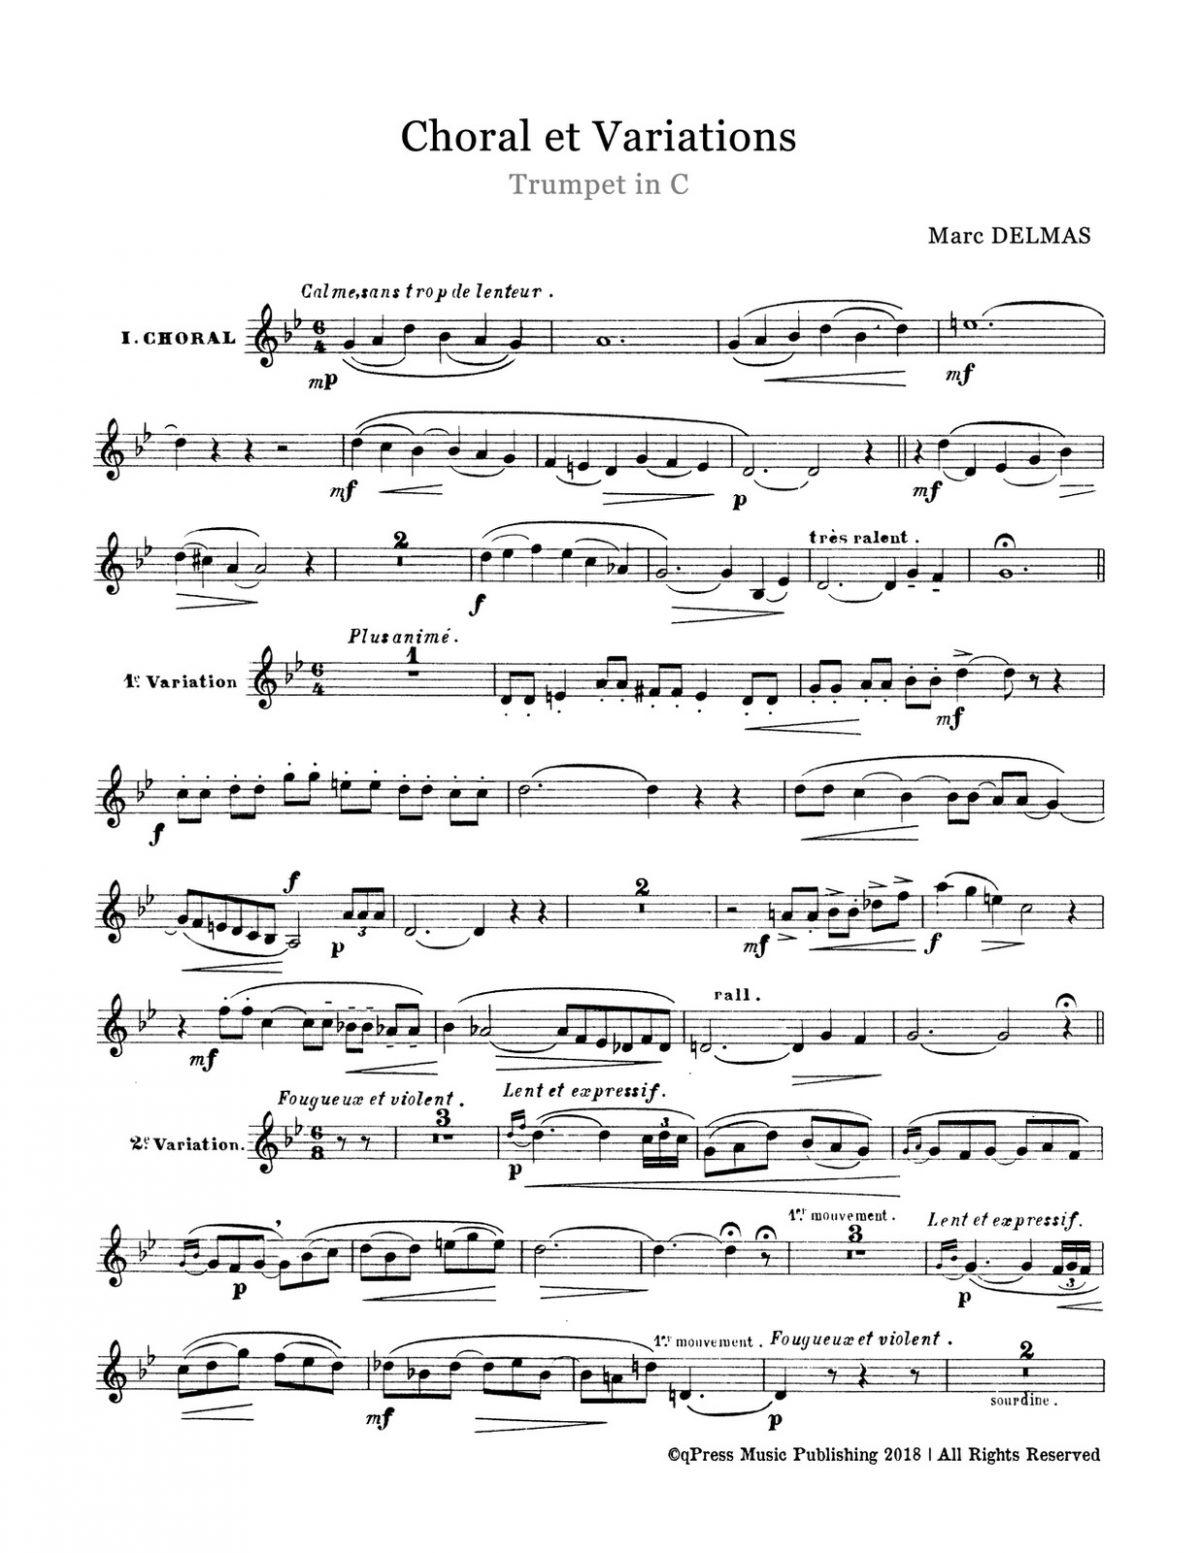 Delmas, Choral et variations-p02